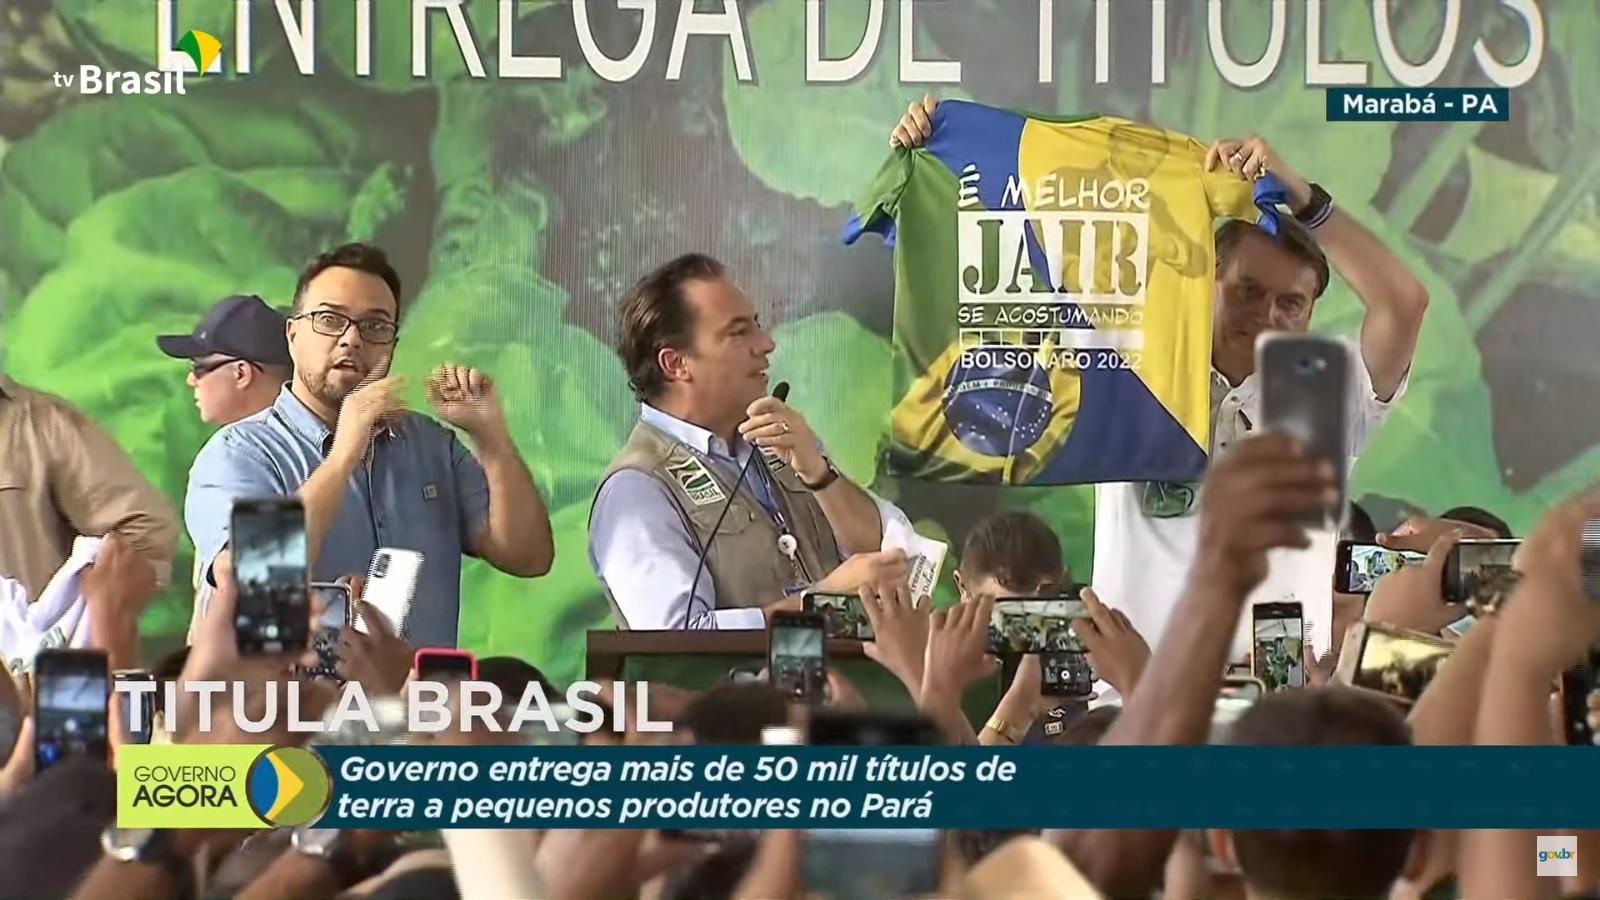 Bolsonaro levanta camisa com slogan